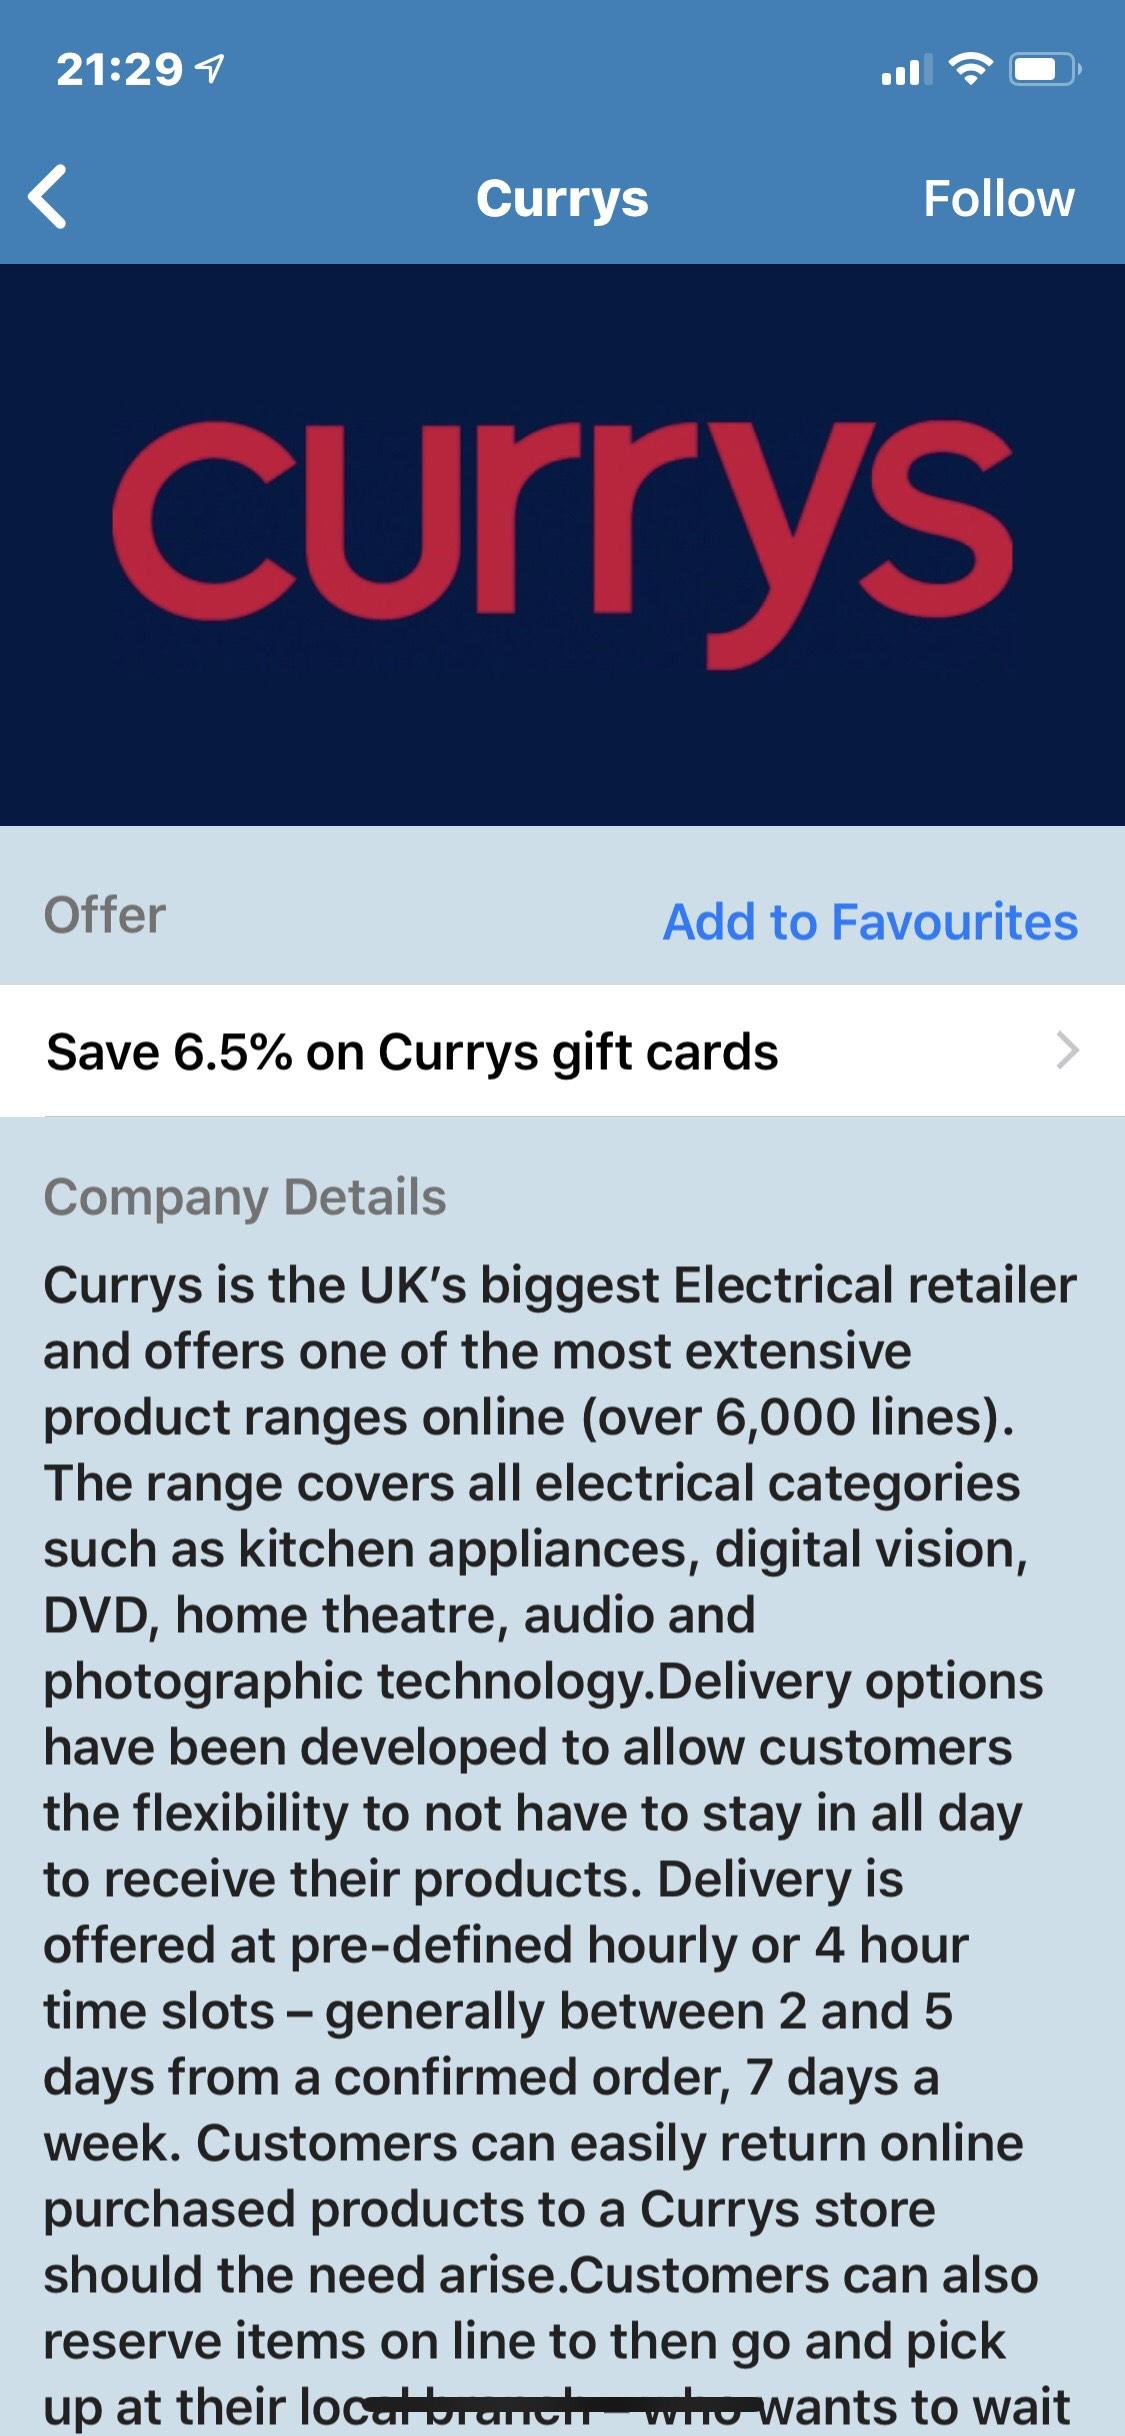 6.5% discount on PC world/Currys gift voucher through Bluelight membership